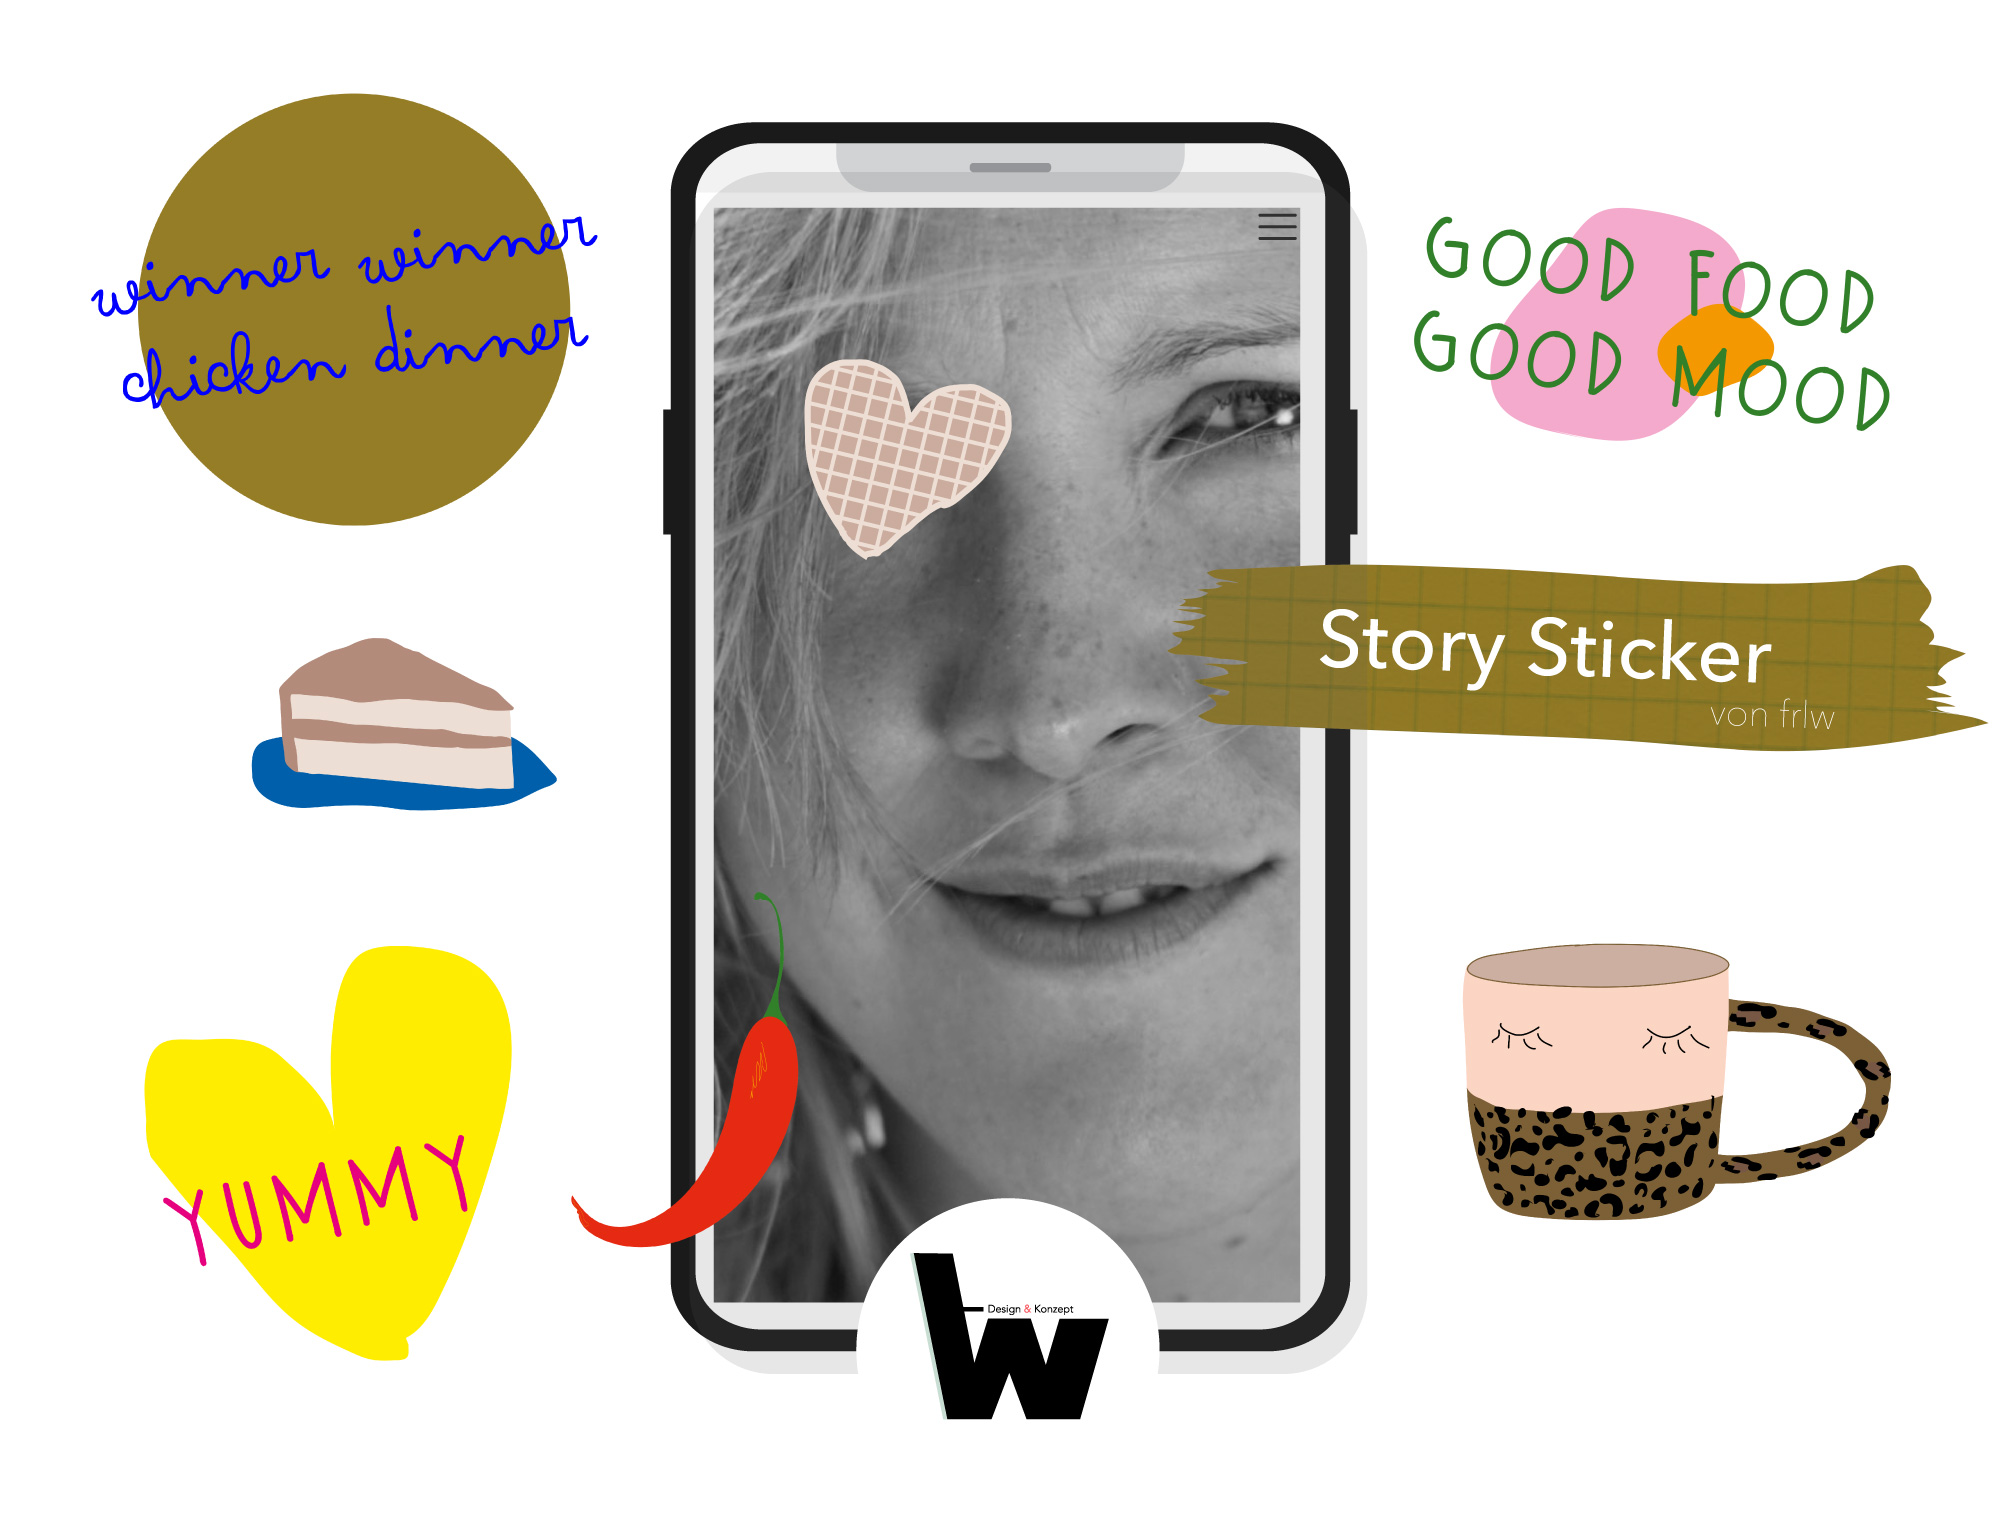 Story-Sticker Food